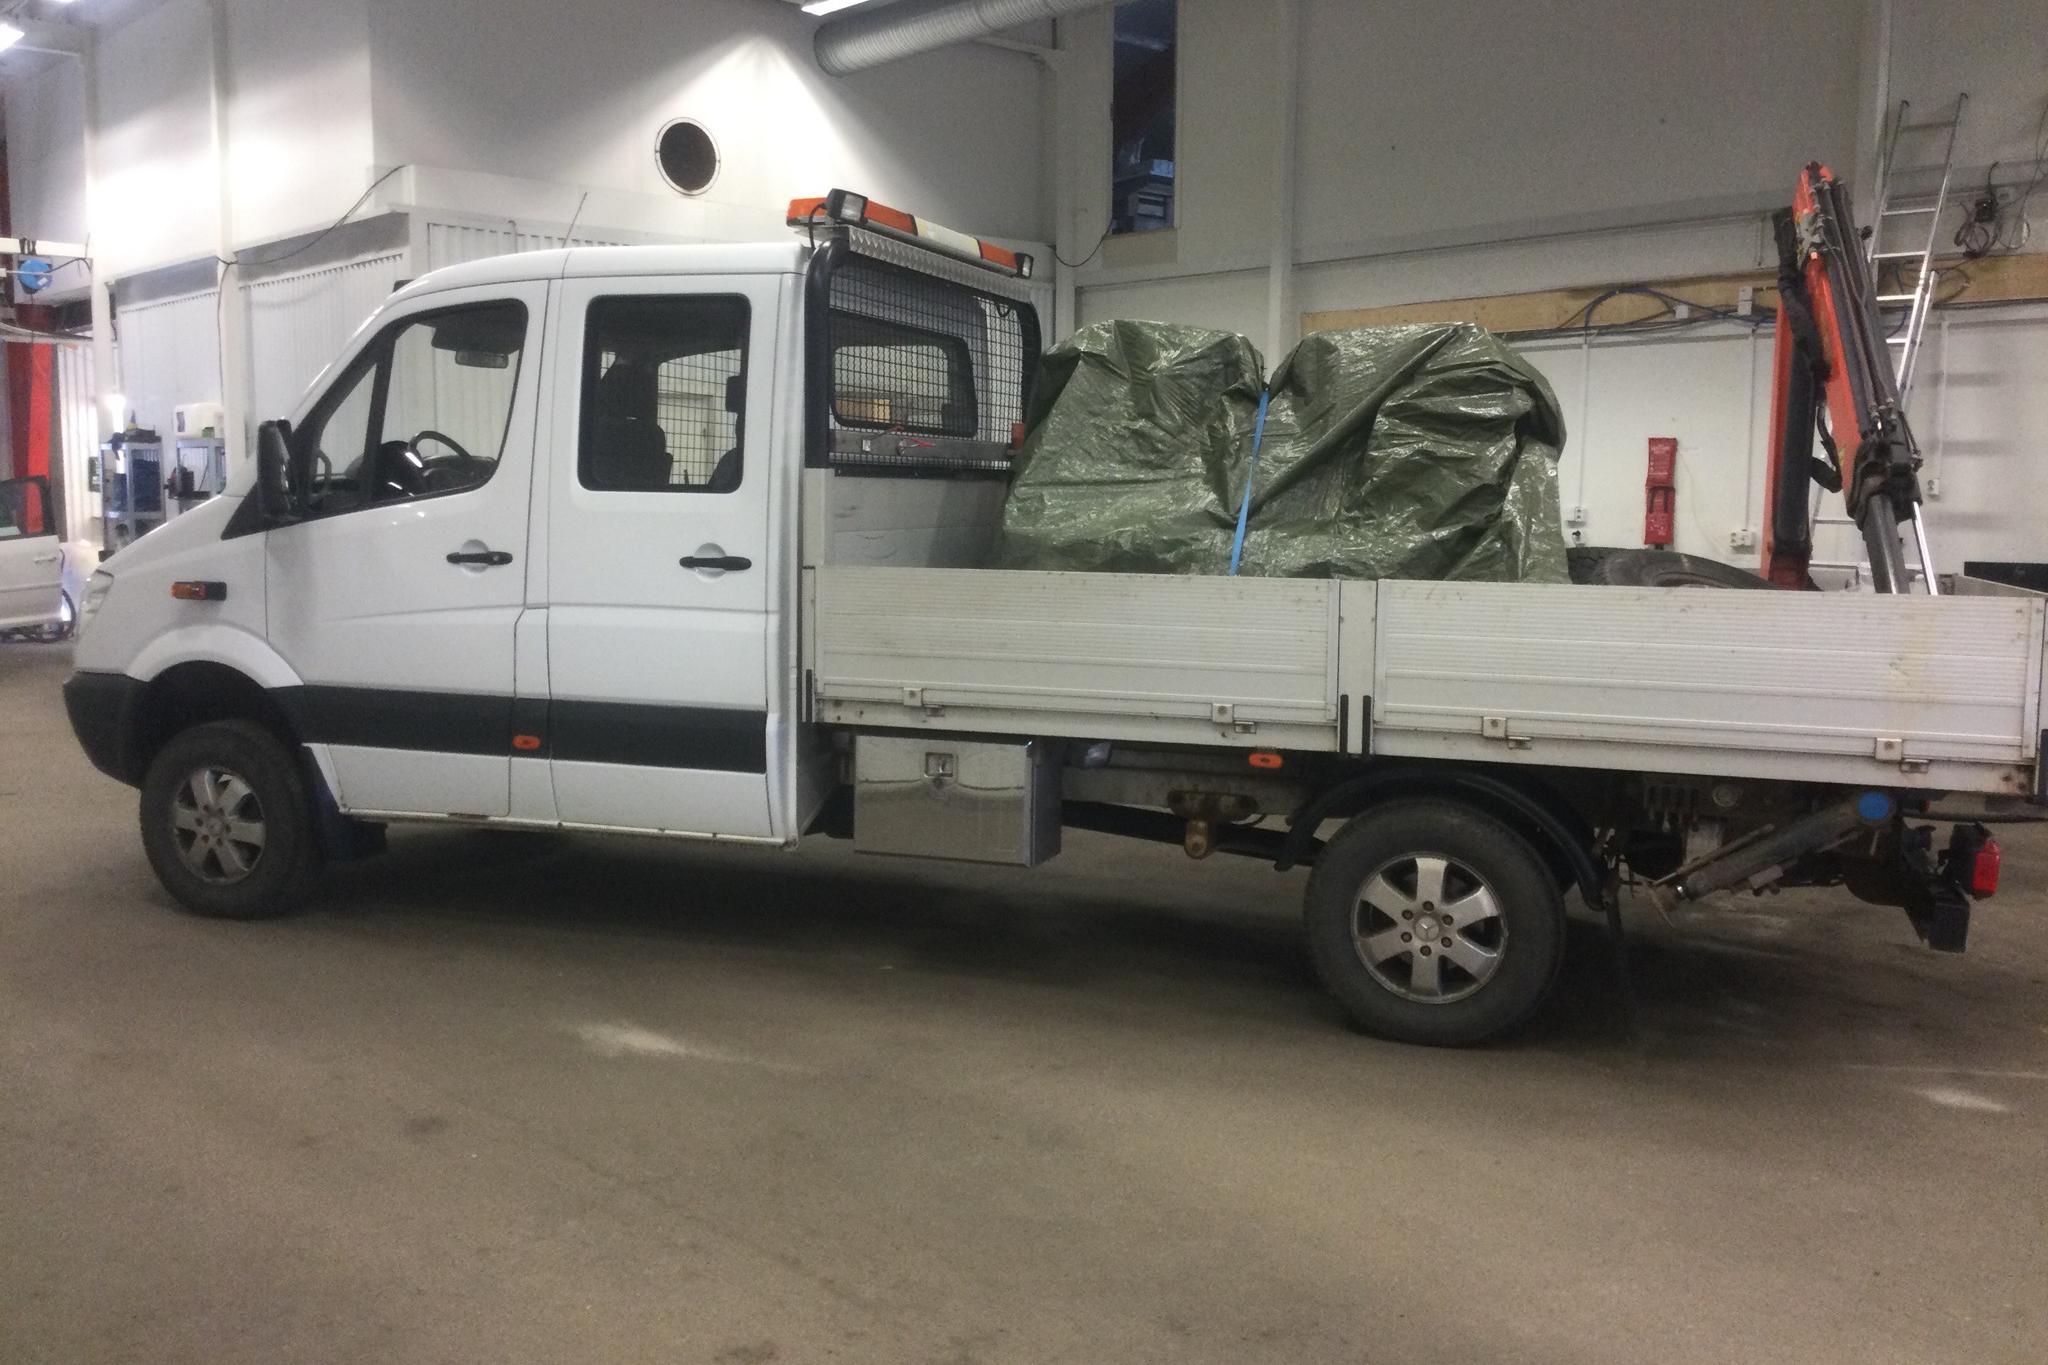 Mercedes Sprinter 213 CDI Crew Cab (129hk) - 19 262 mil - Automat - vit - 2012